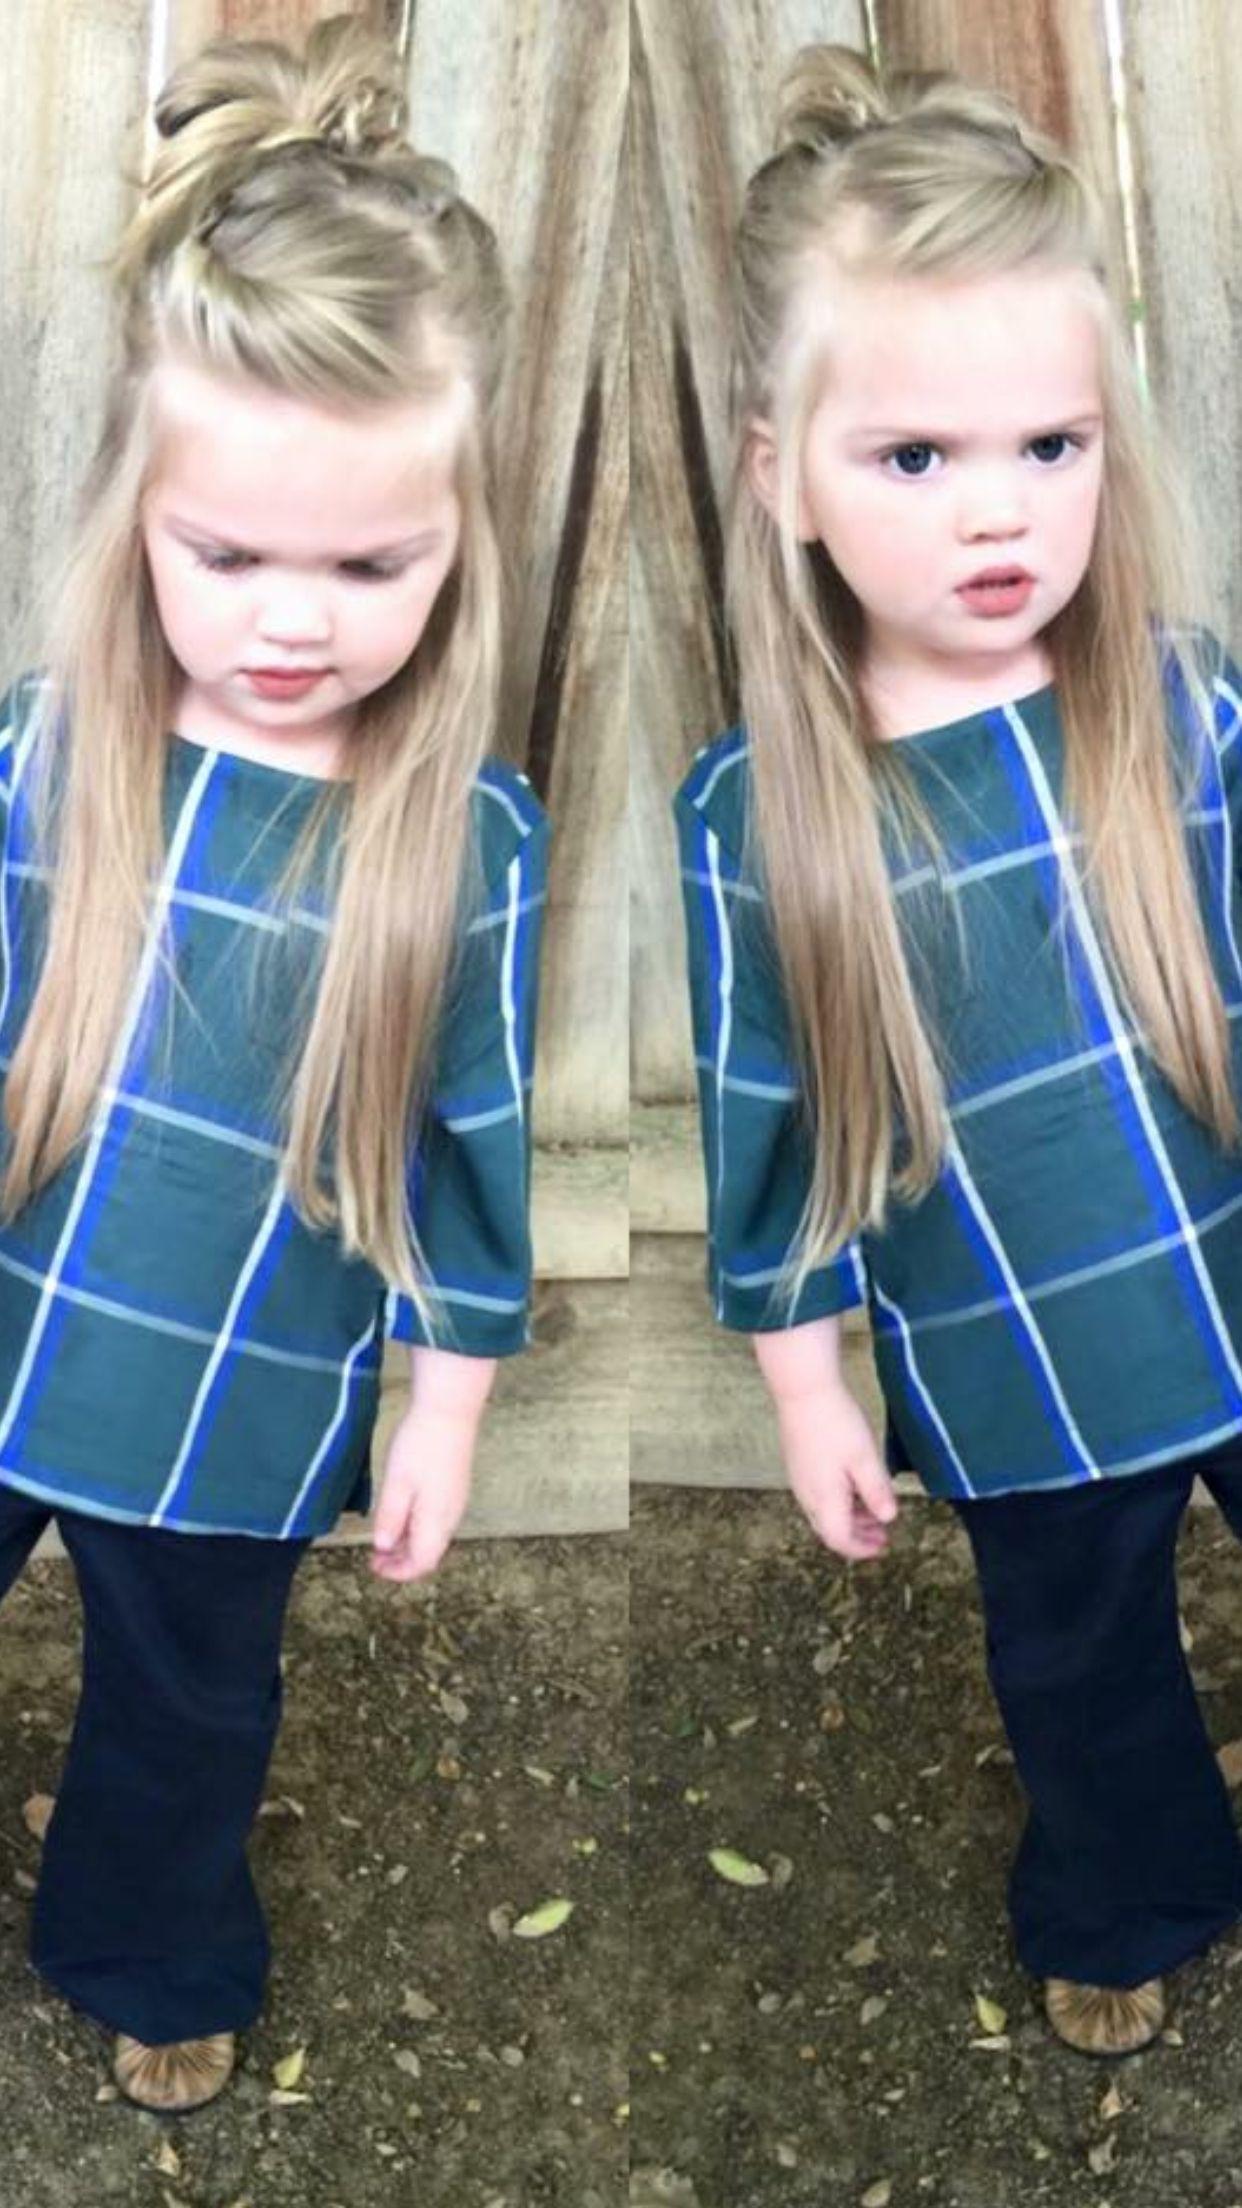 Little Girl Hairstyles Half Up Half Down Top Knot Messy Bun Littlegirlhairstyles Toddler Girl Haircut Baby Girl Hairstyles Little Girl Haircuts